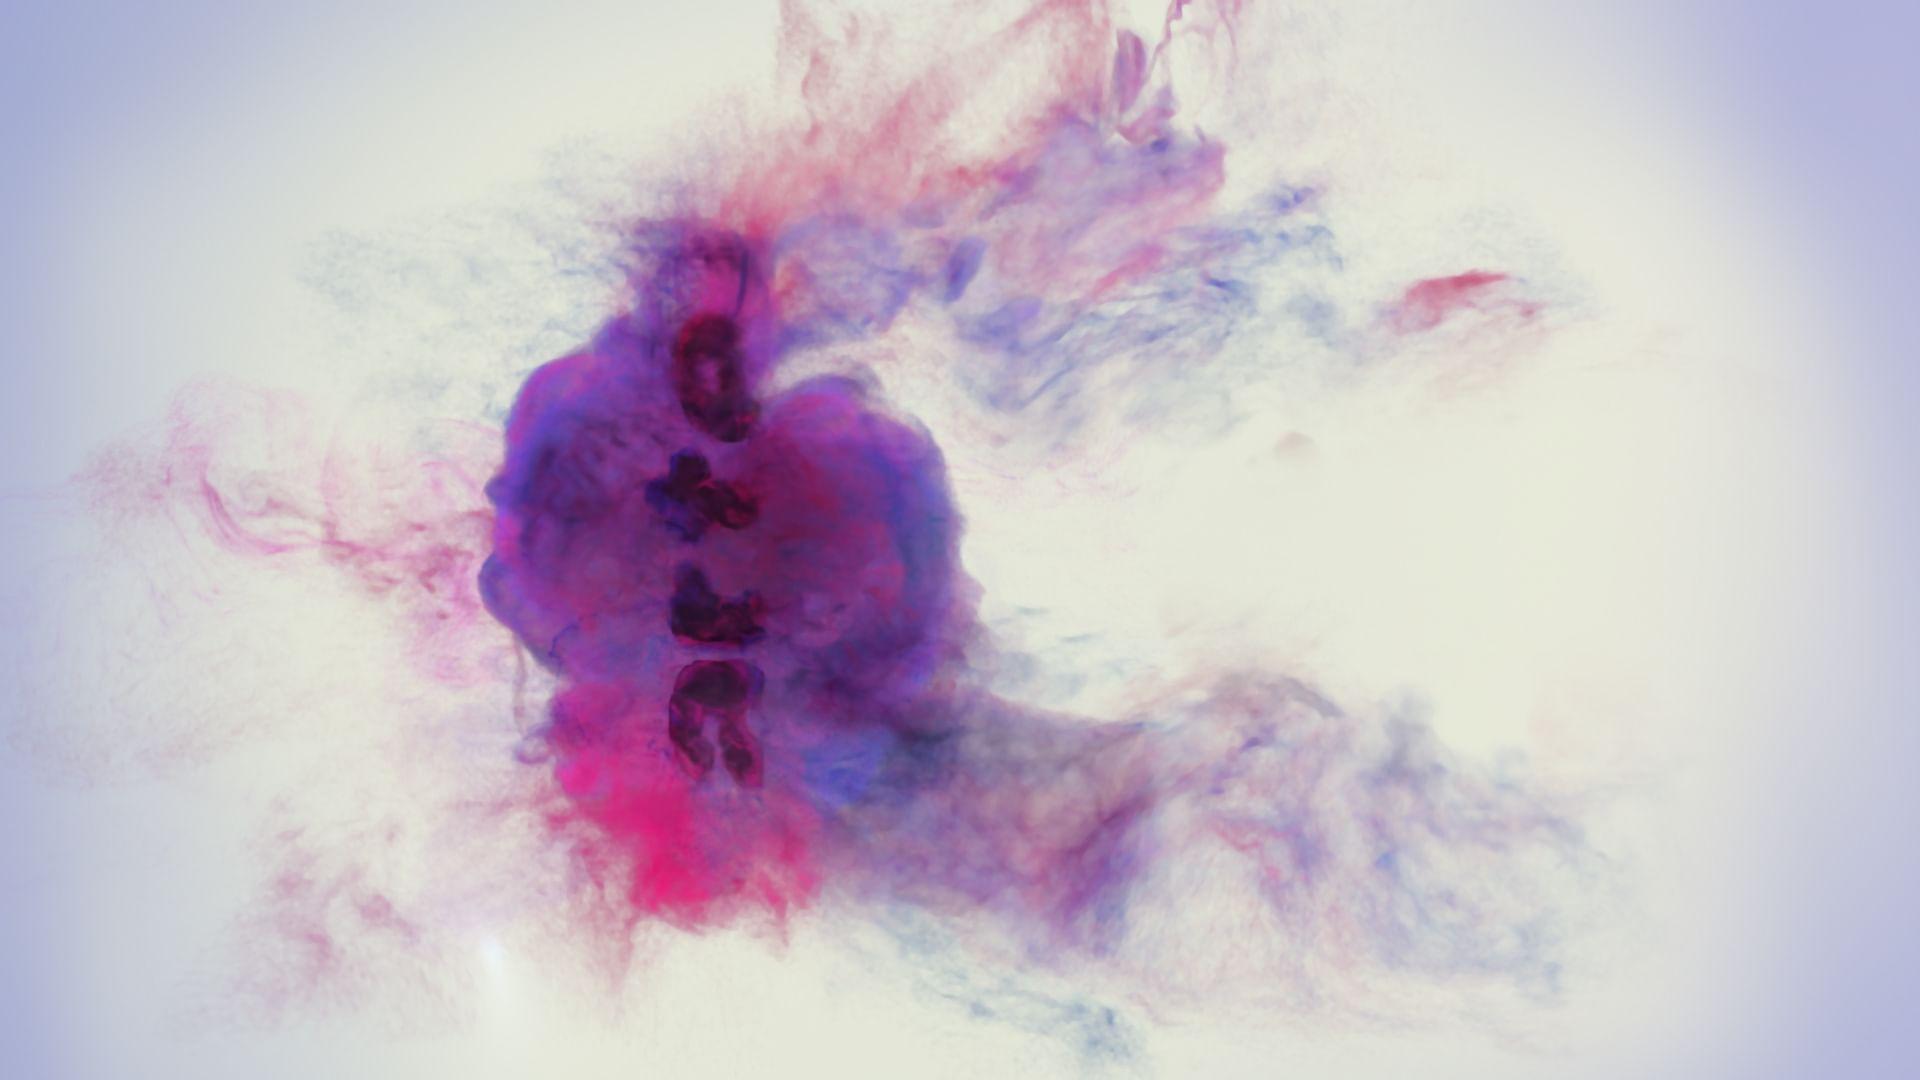 Loulou (1/11)